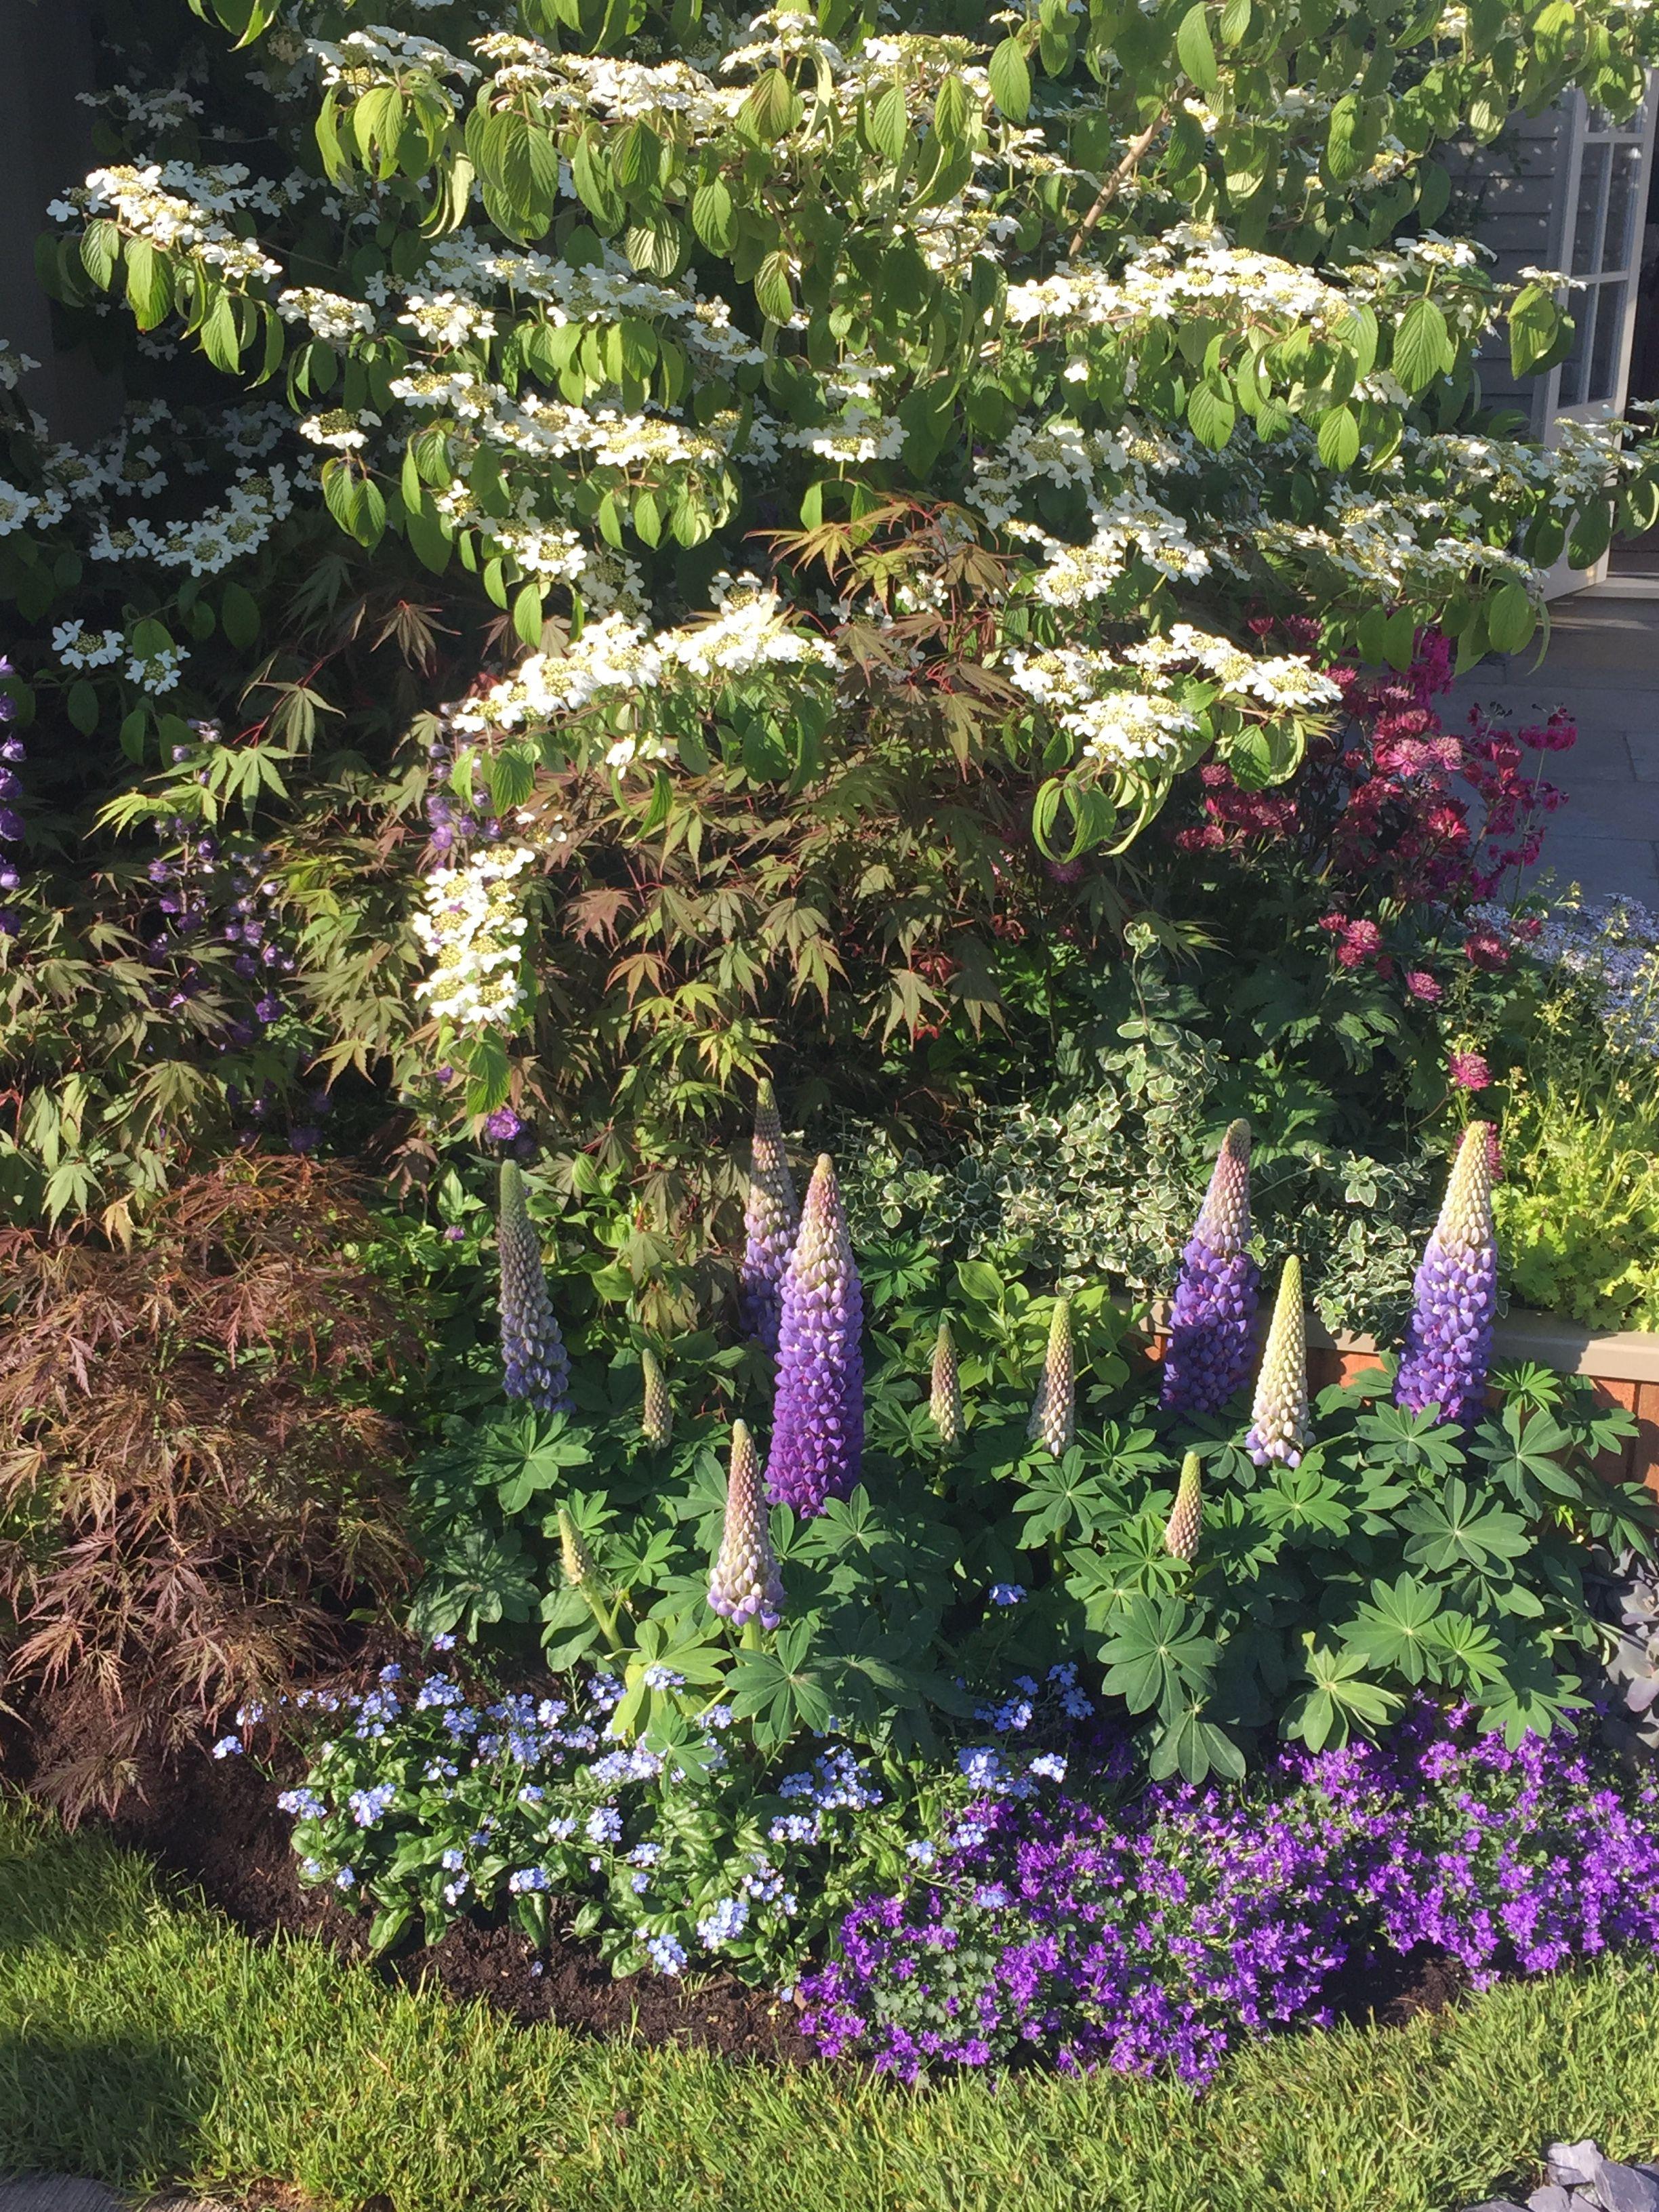 Viburnum And Lupins Chelsea Flower Show 2019 Jt Sloped Garden